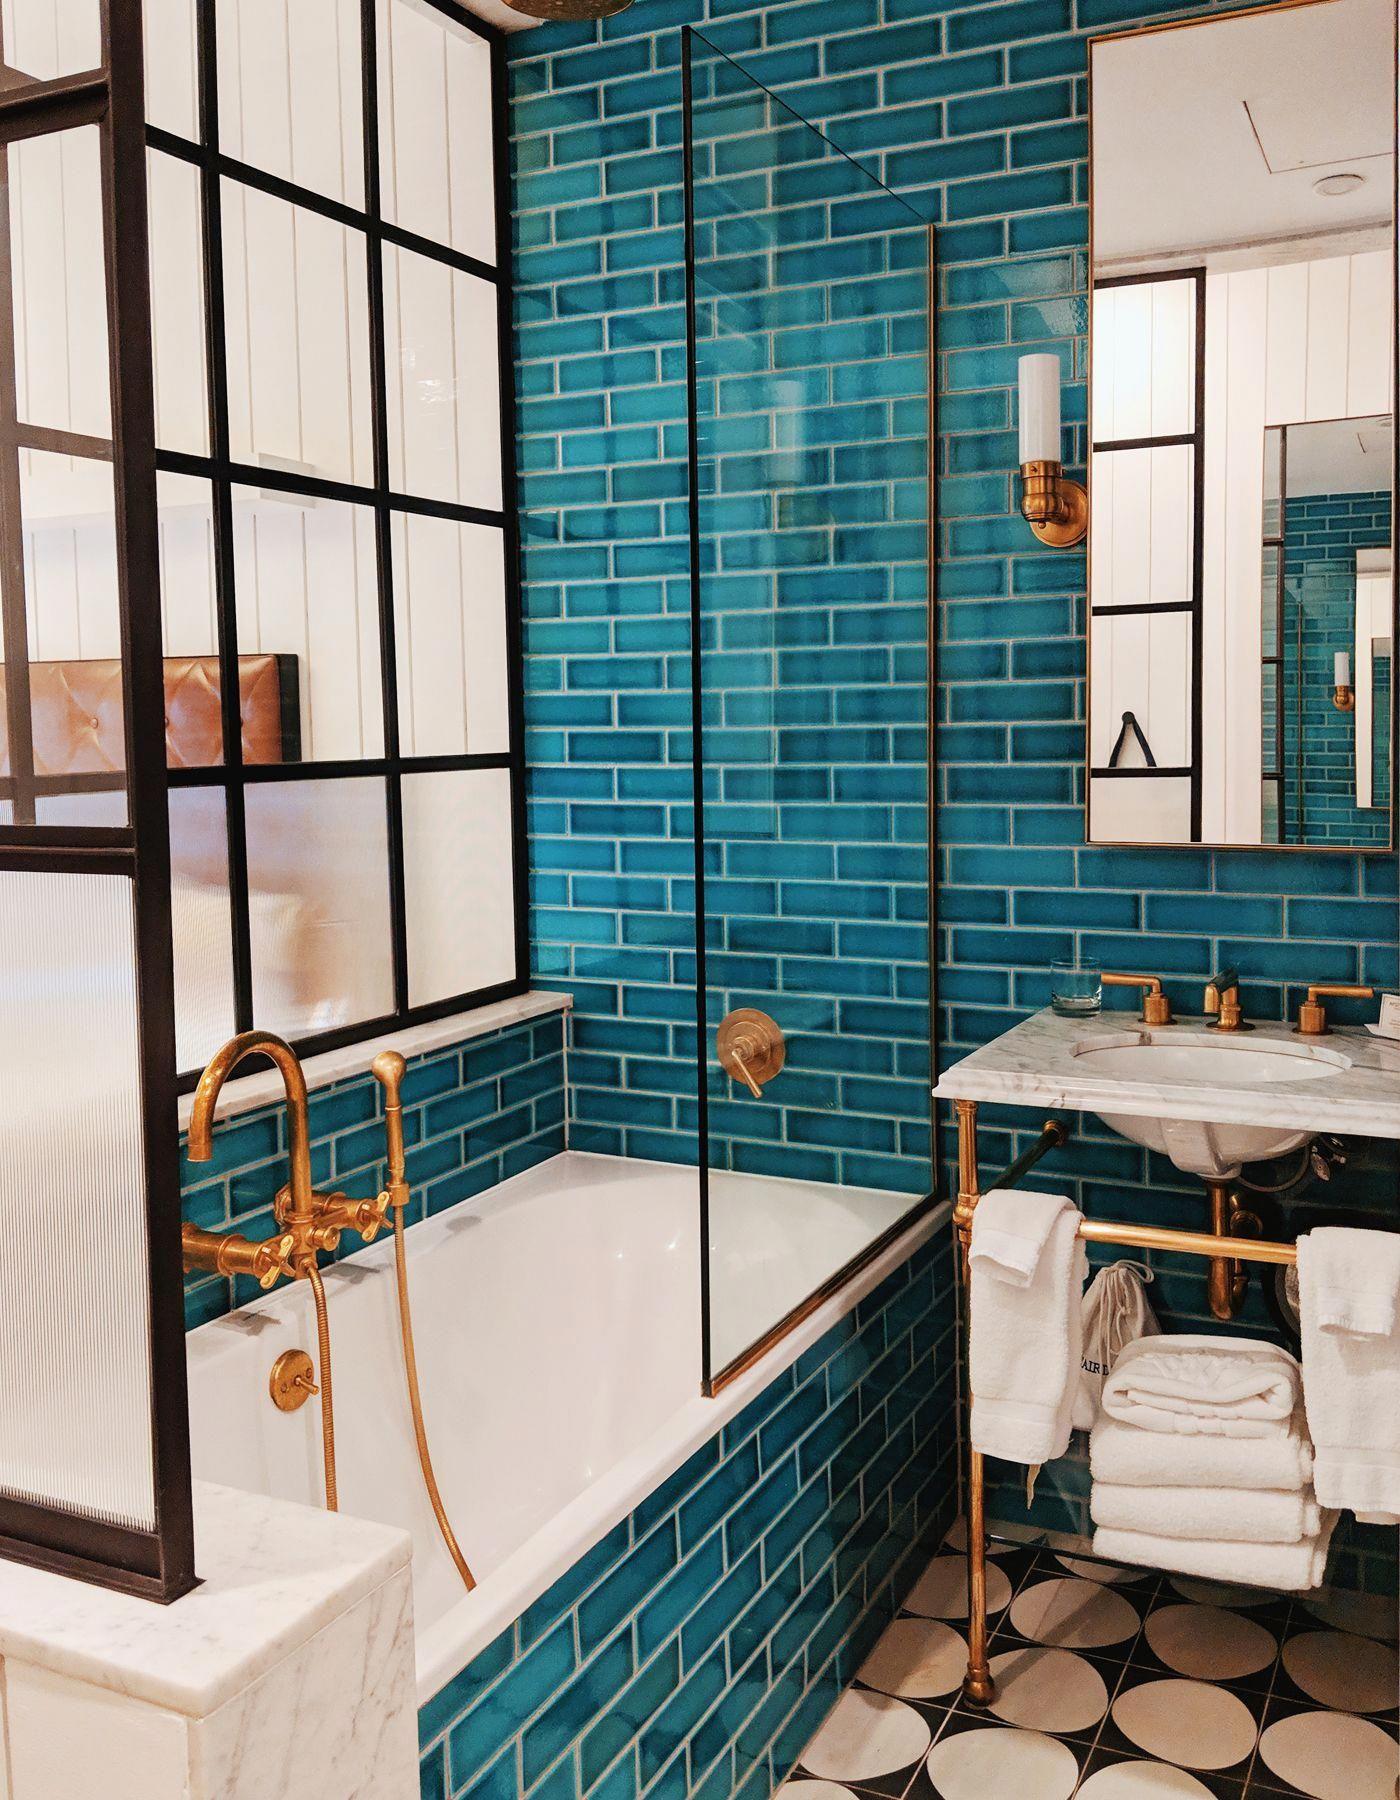 Bathroom Goals At The Williamsburg Hotel Bathroominspo Bathroom Interior Design Bathroom Interior Mid Century Modern Bathroom